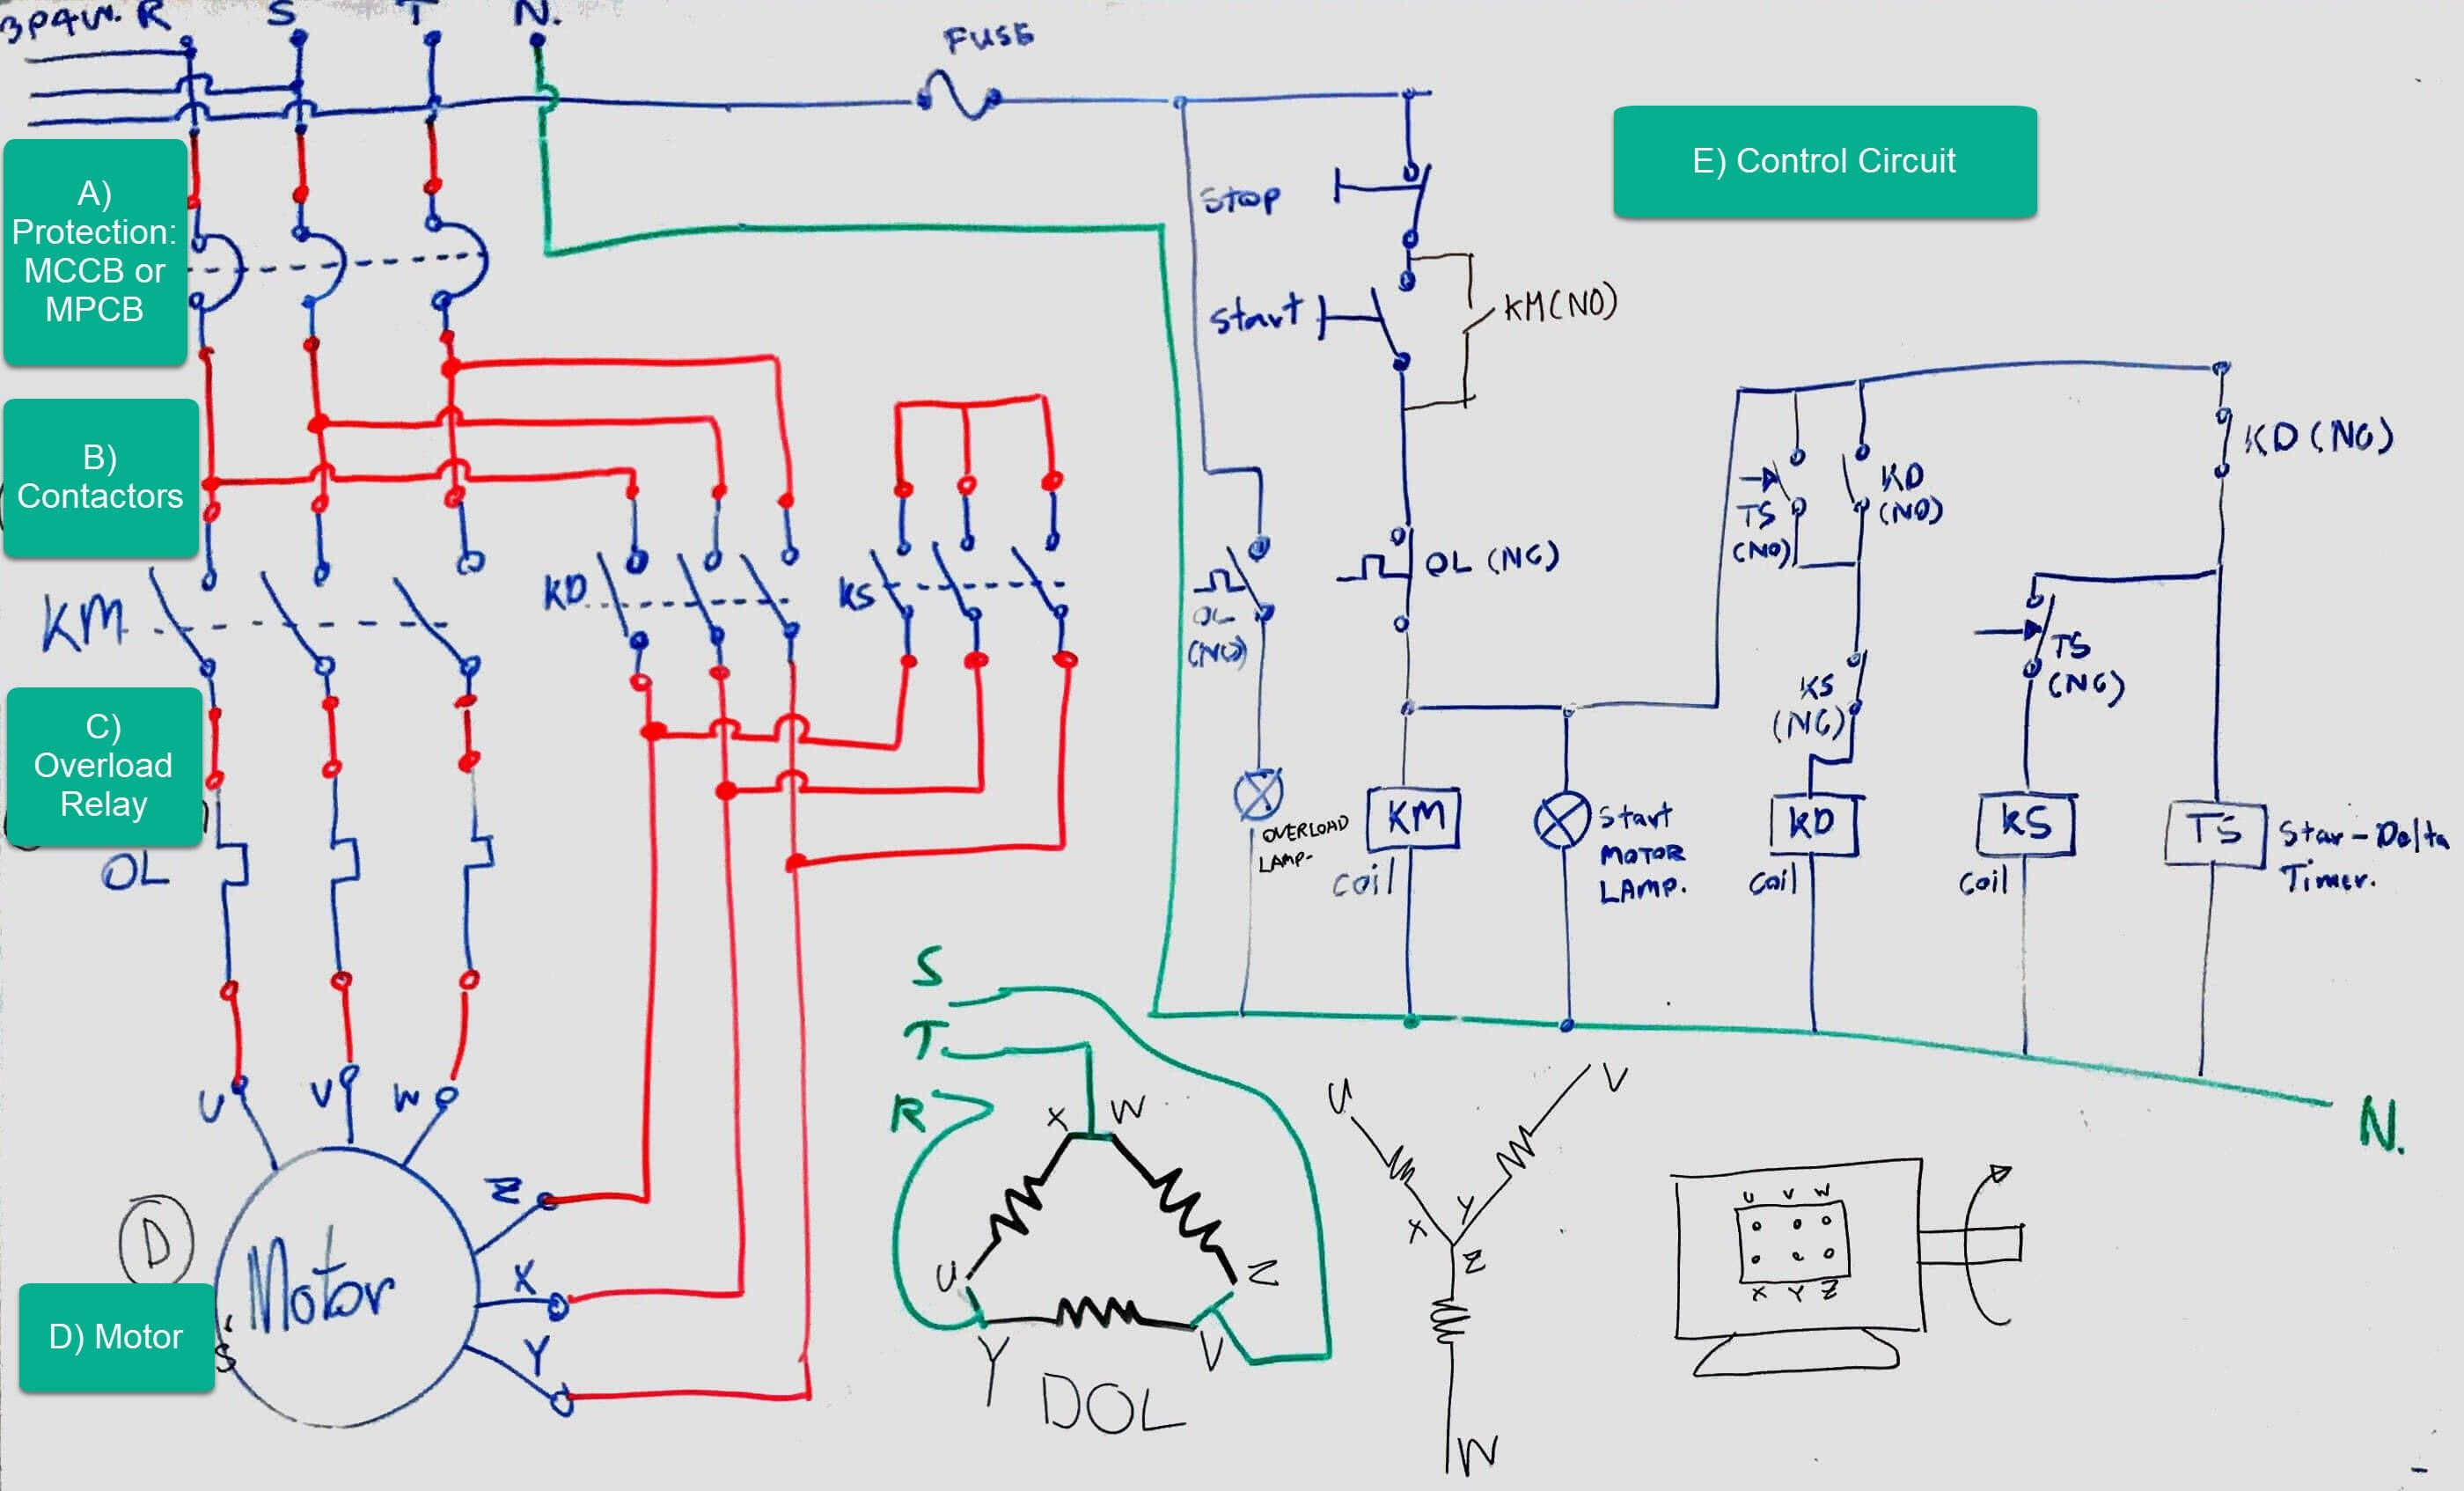 [SCHEMATICS_4LK]  Delta Wire Diagram Bmw E39 Sunroof Wiring Harness -  furnaces.anggurmasam.astrea-construction.fr | Delta Wiring Diagram |  | ASTREA CONSTRUCTION